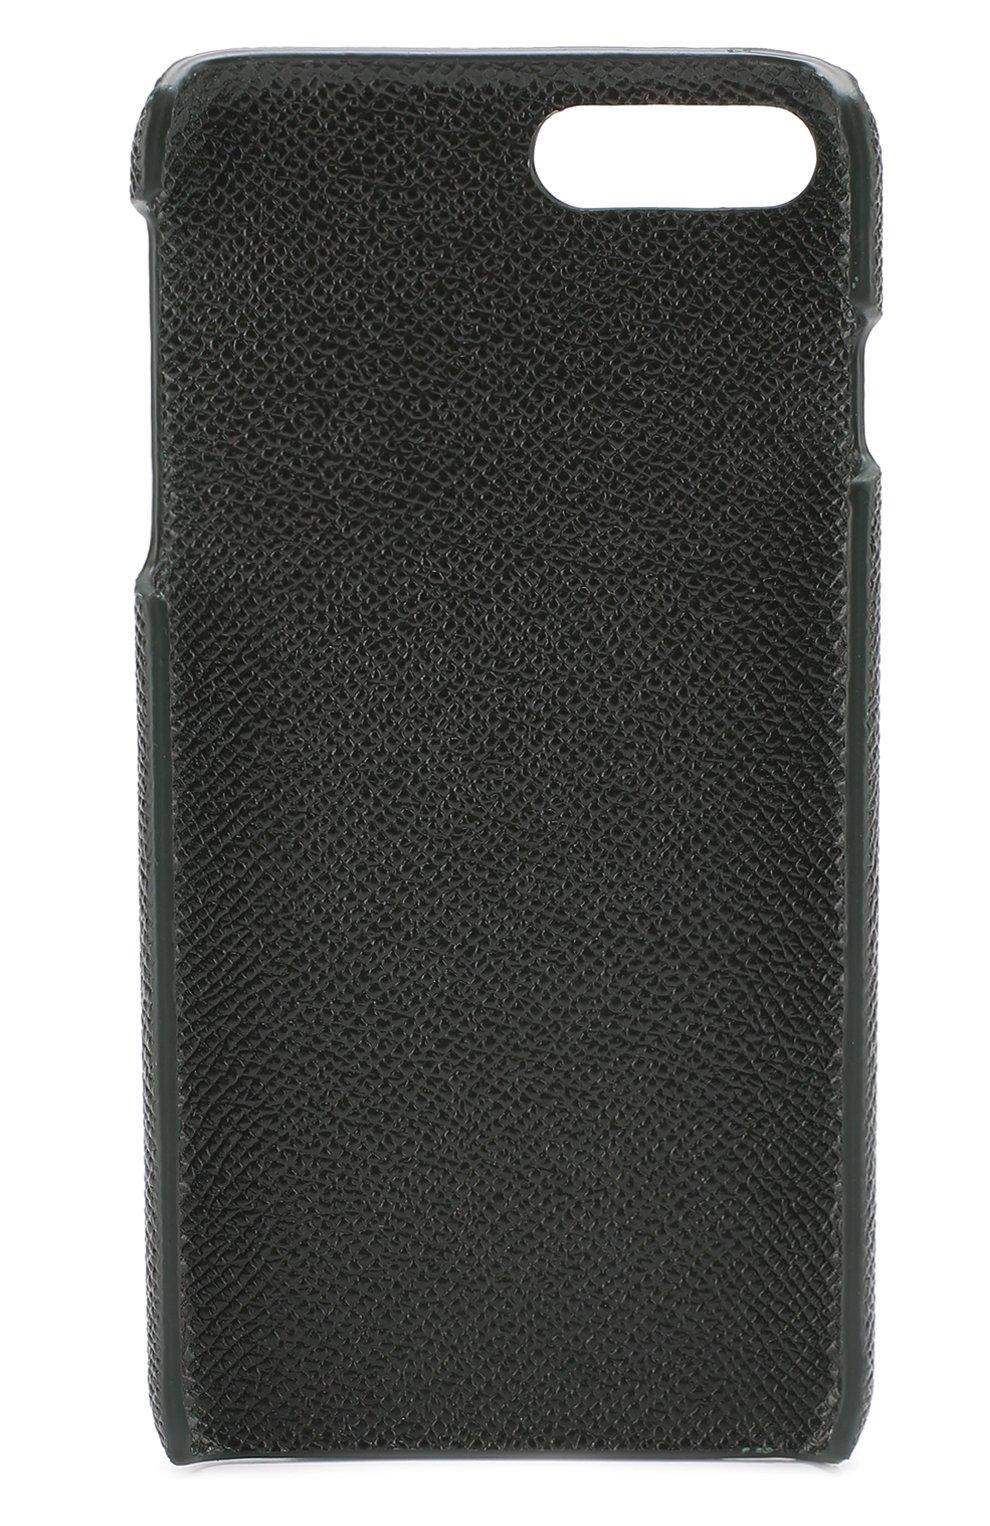 Кожаный чехол для iPhone 7 Plus Dolce & Gabbana  | Фото №2